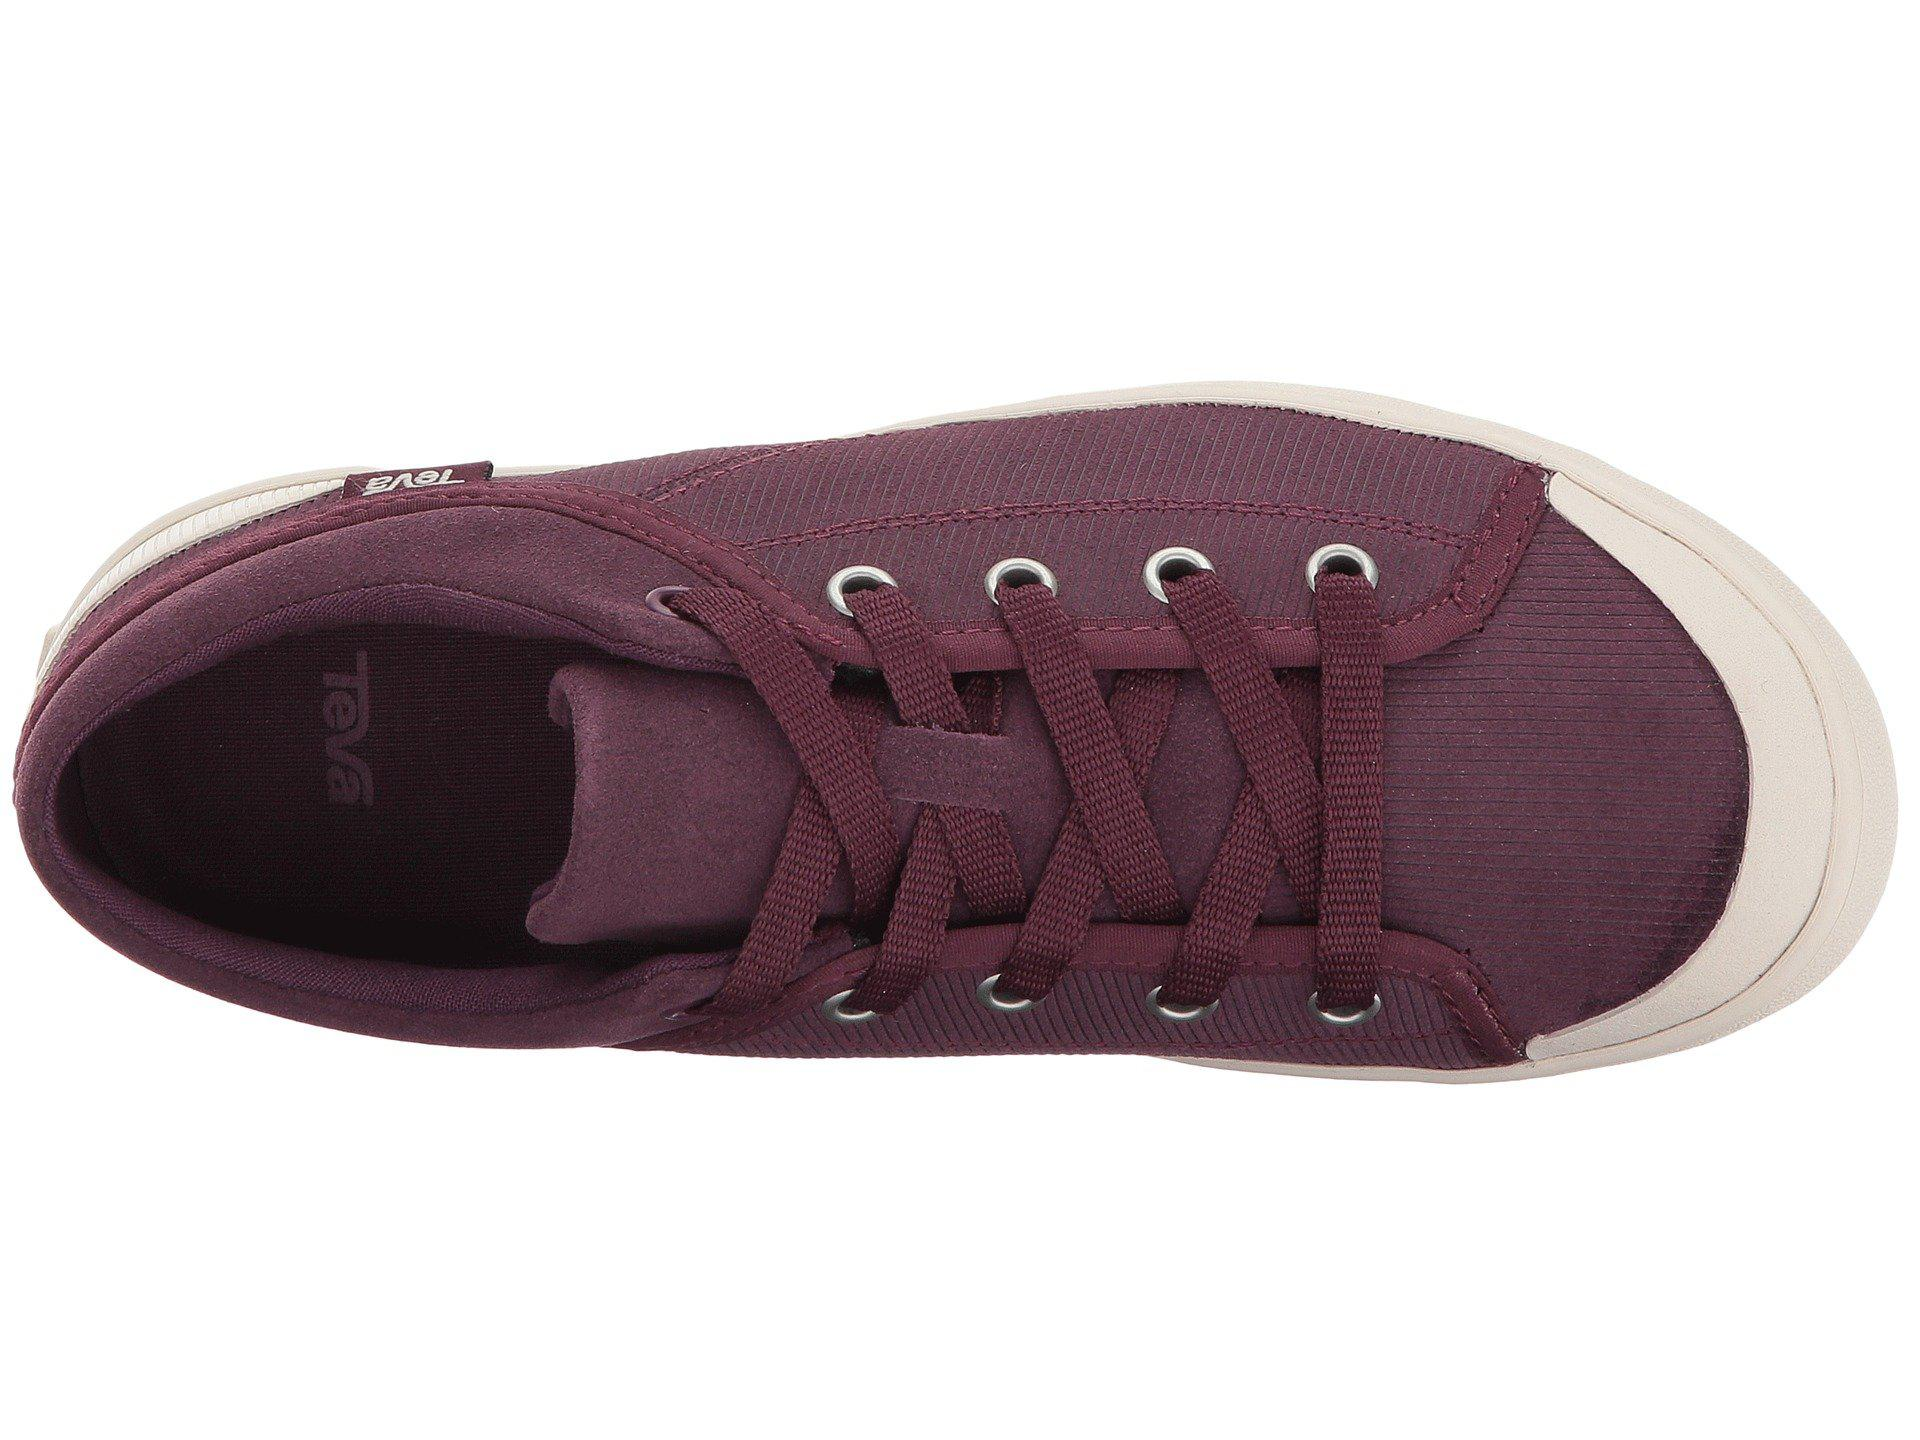 ce8f1fa03c40a4 Teva - Purple Freewheel Corduroy - Lyst. View fullscreen